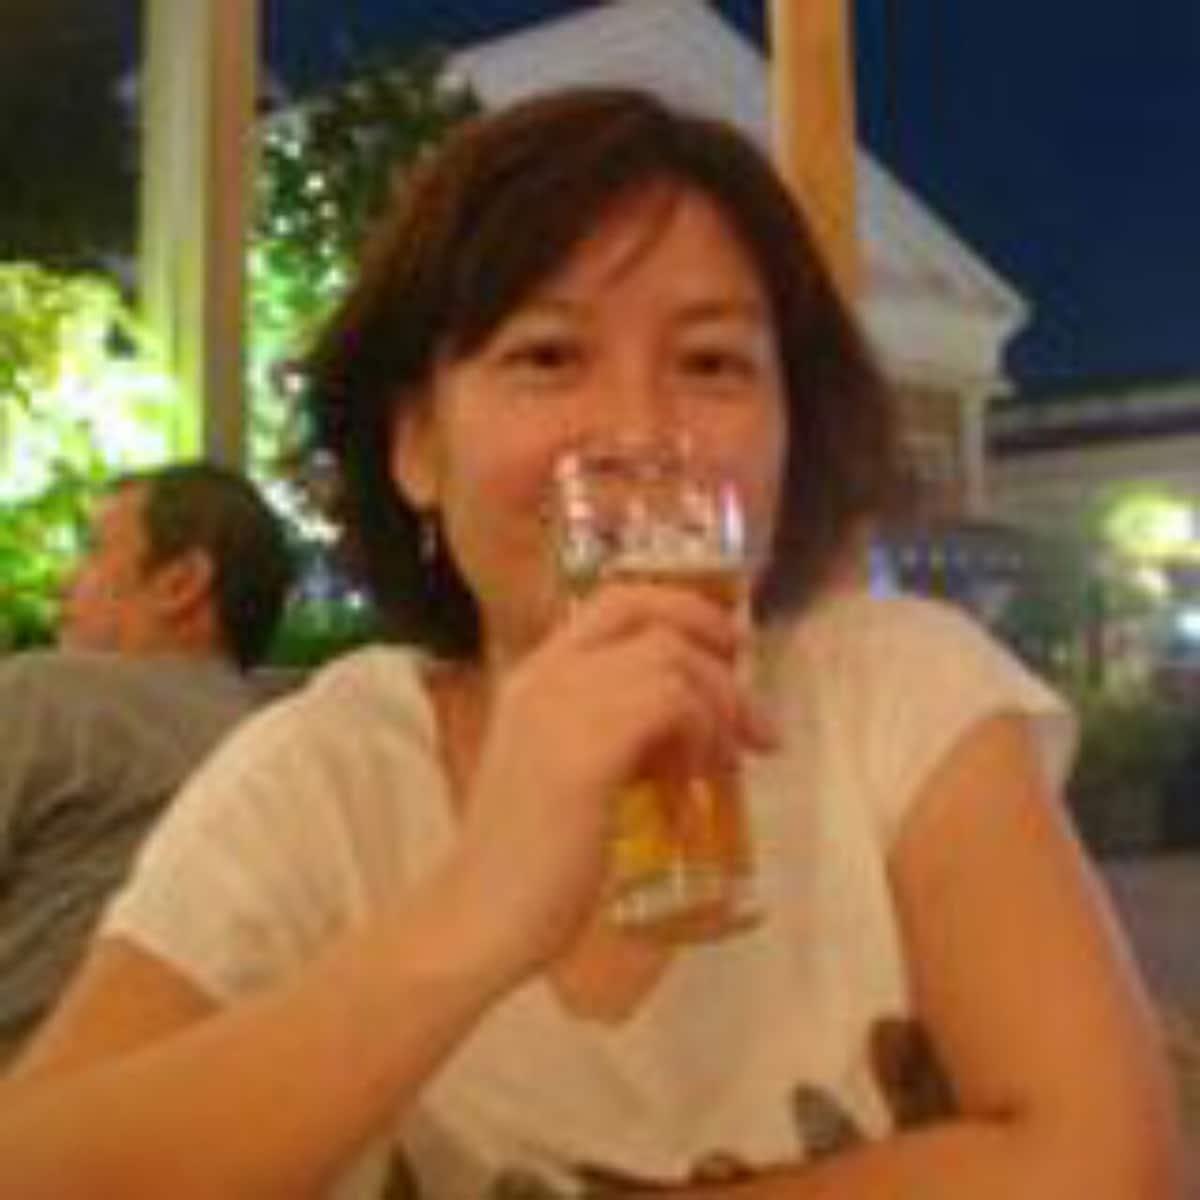 Hyunjung from Mapo-gu